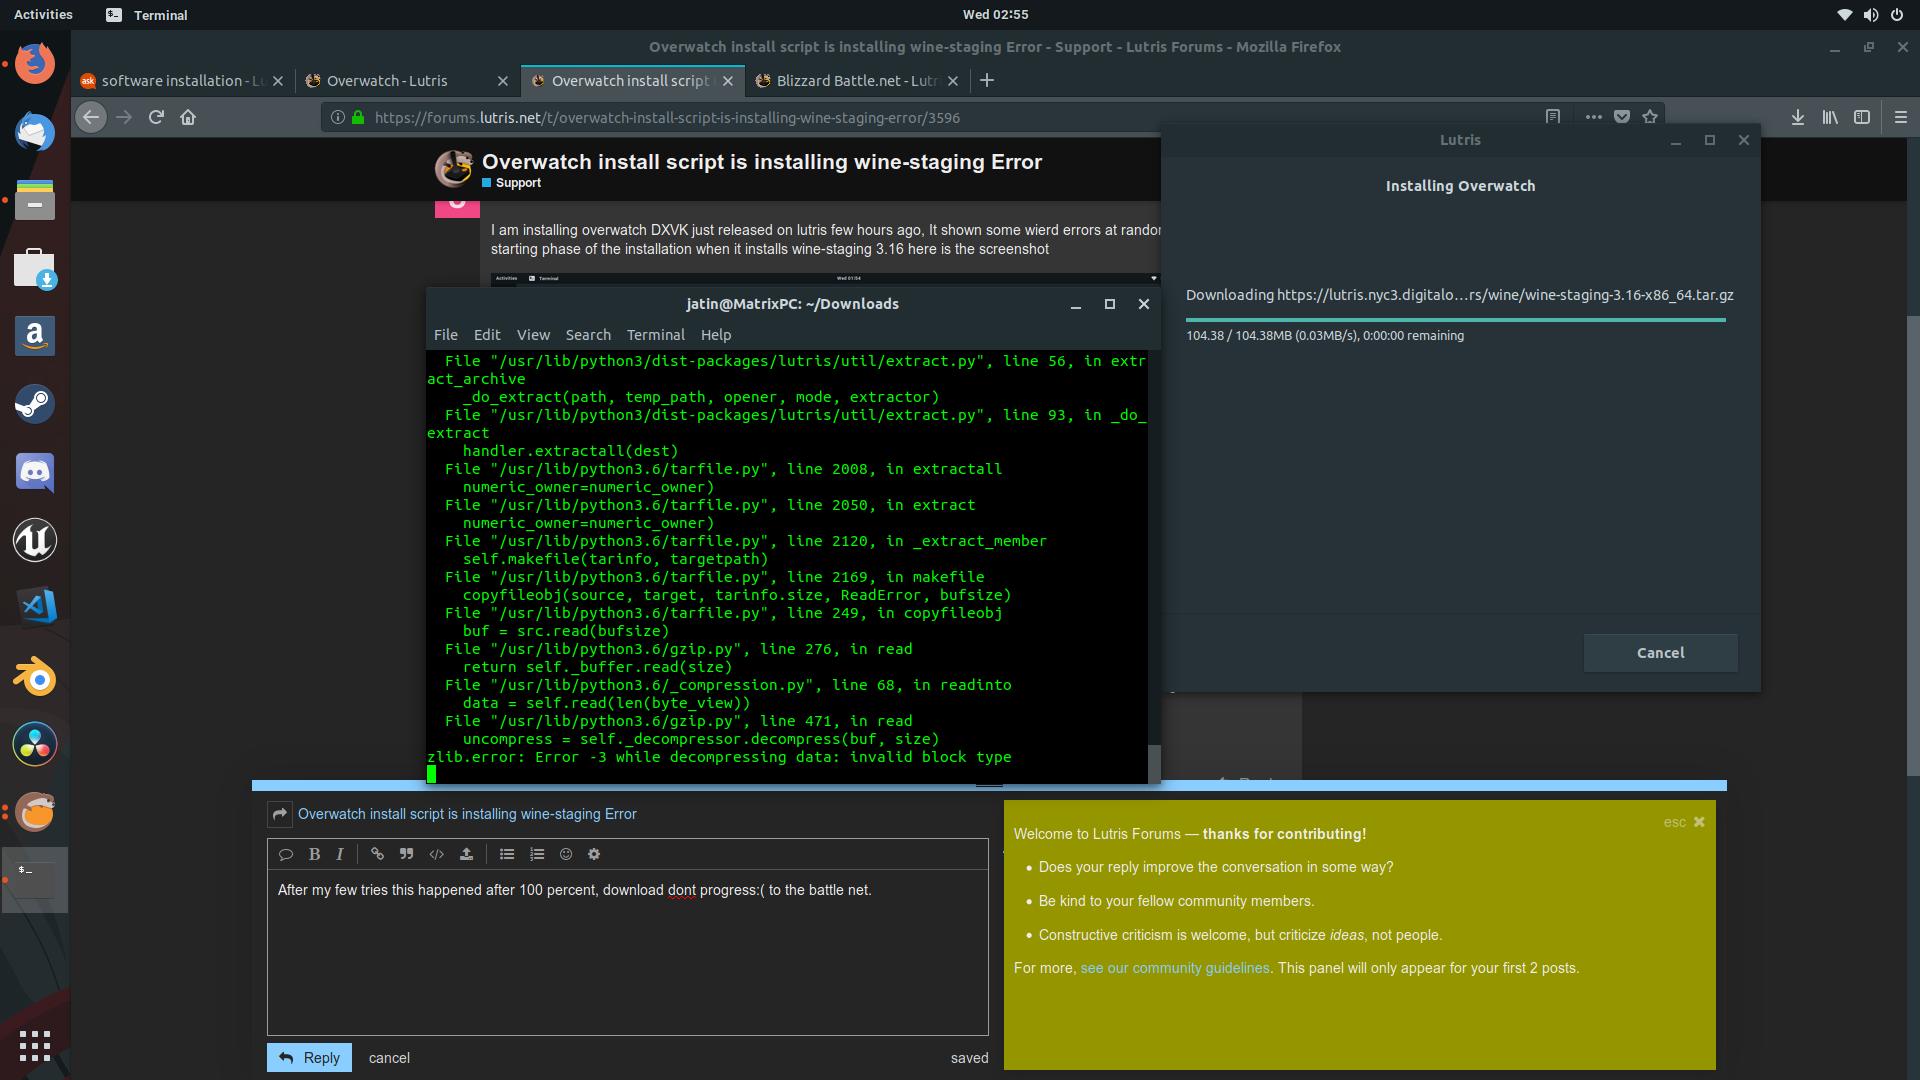 Overwatch install script is installing wine-staging Error - Support